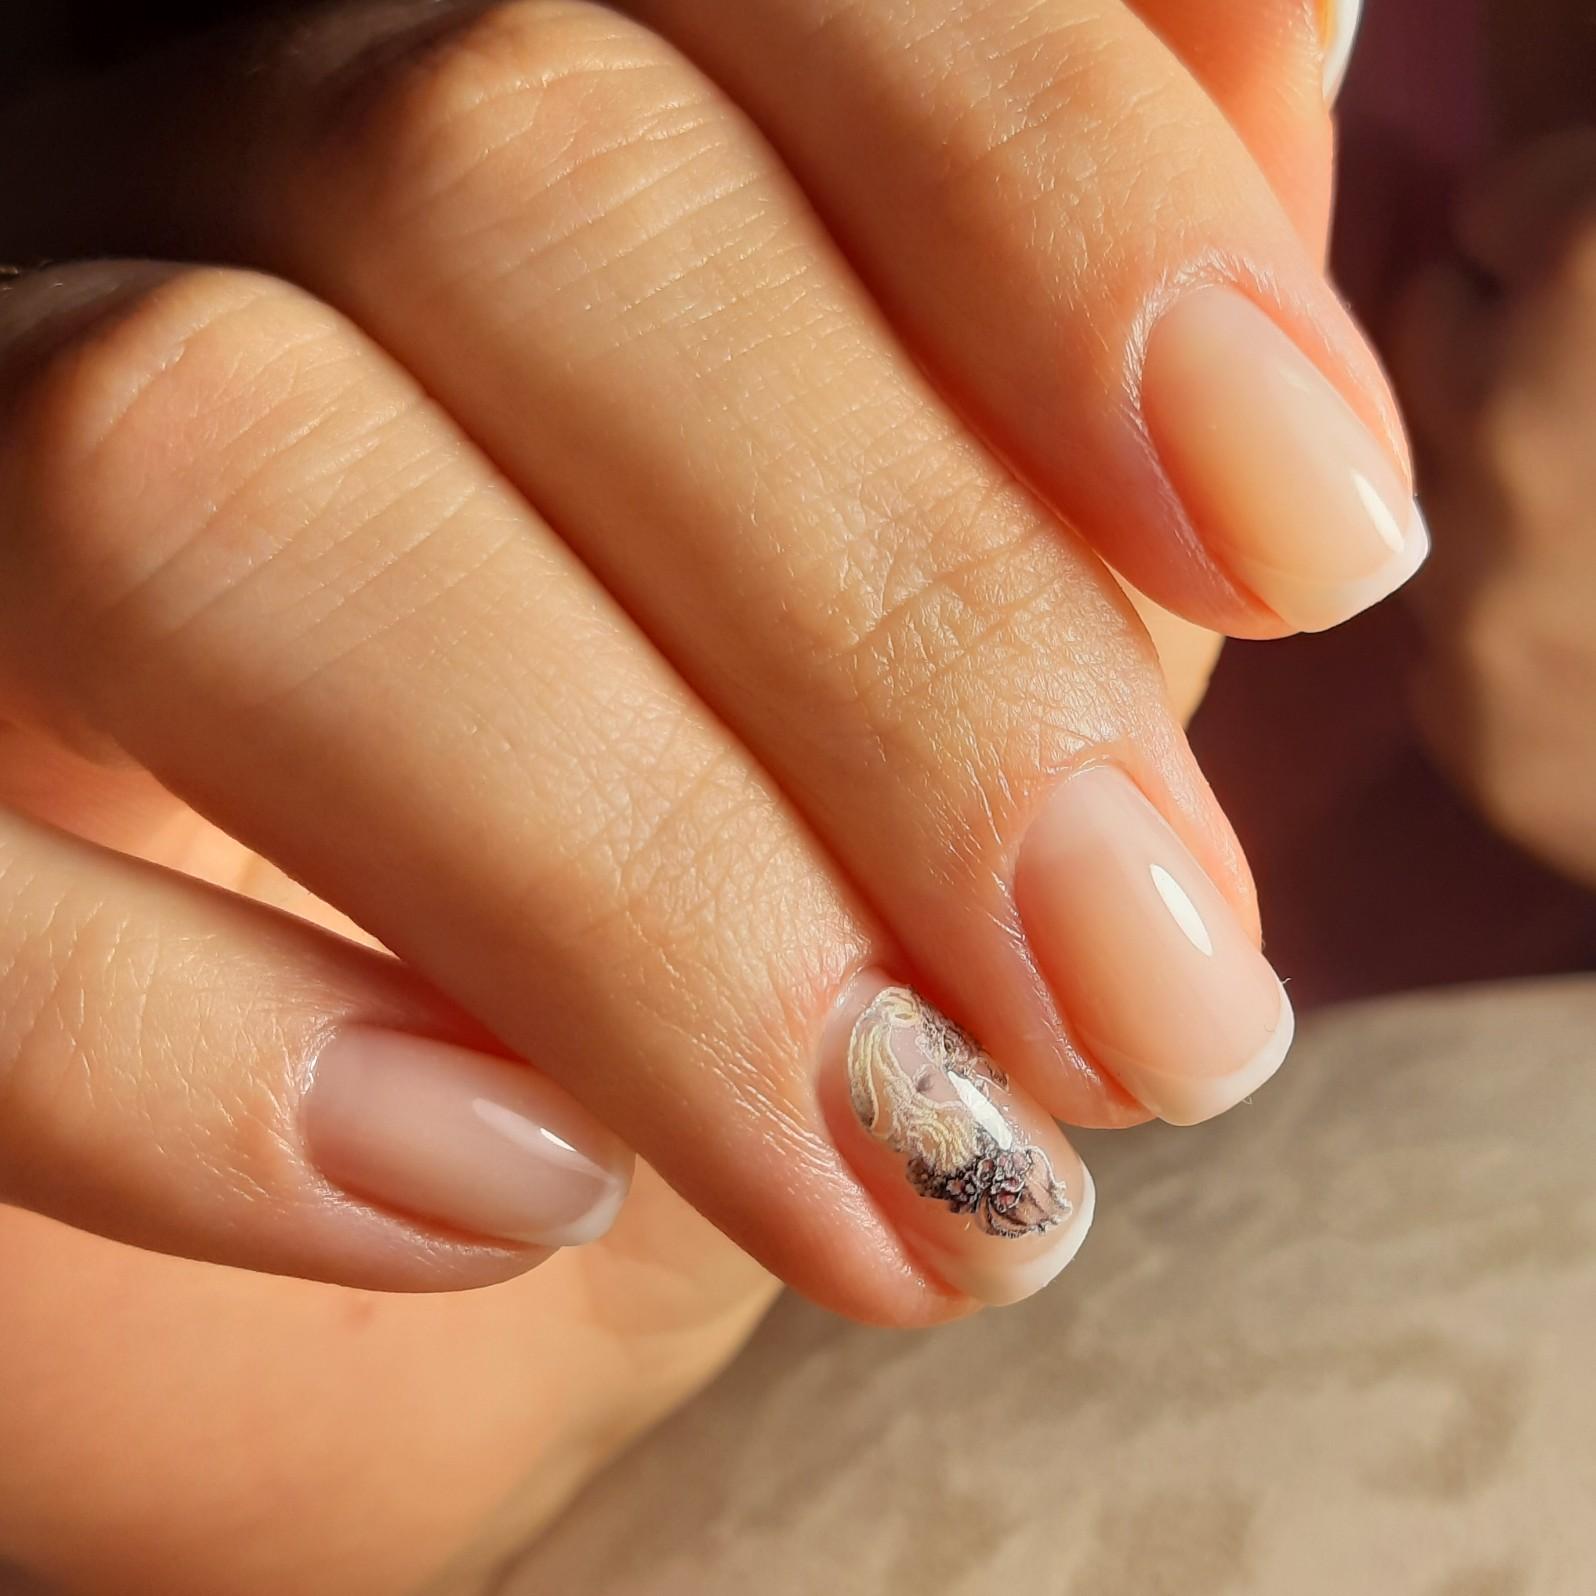 Френч с цветочными слайдерами на короткие ногти.